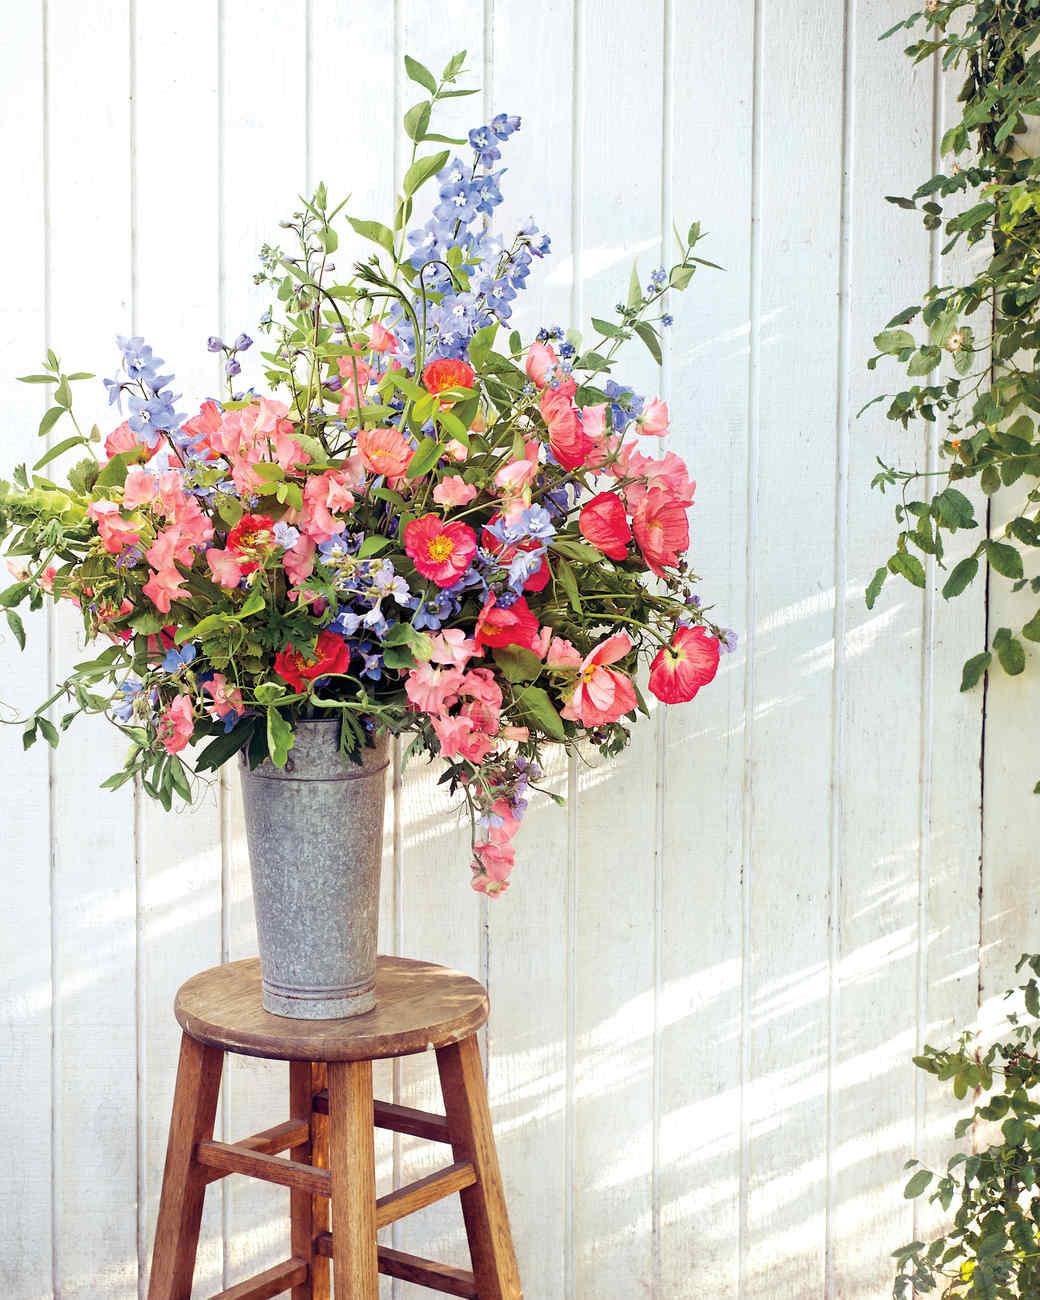 floret-flower-farm-124-edit-d111323.jpg